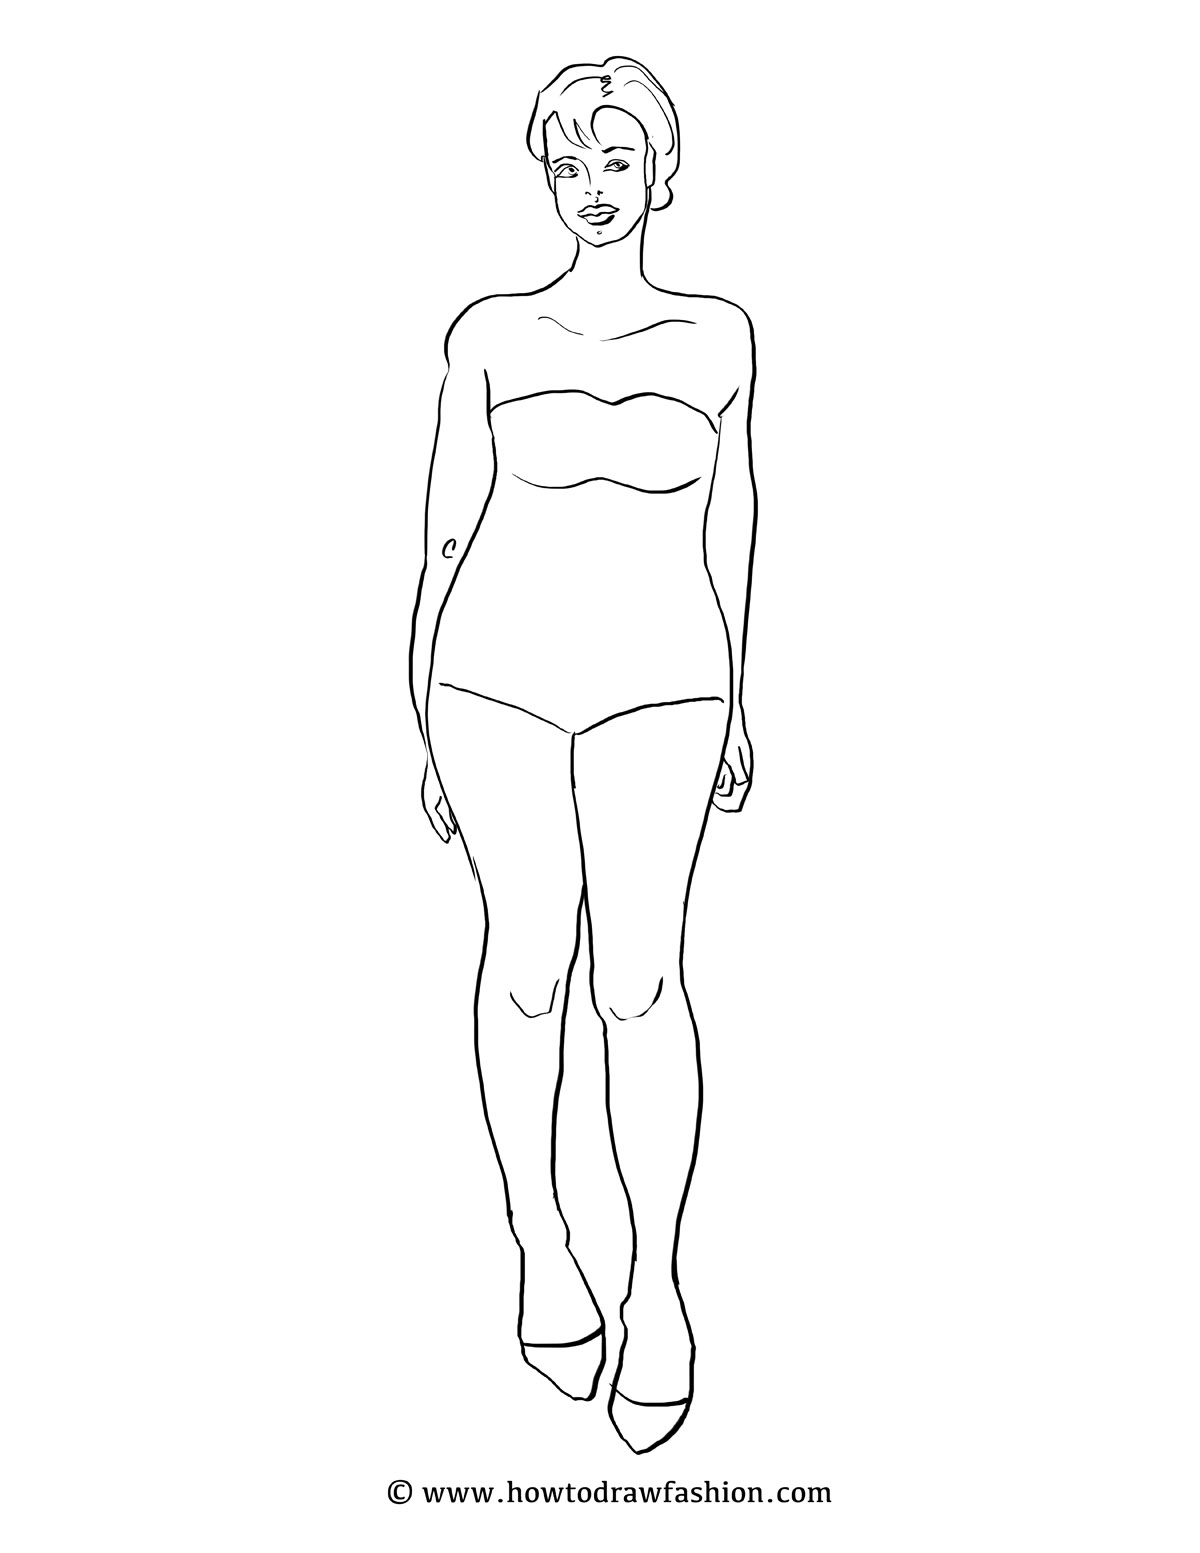 How To Draw Fashion Fashion Templates Women